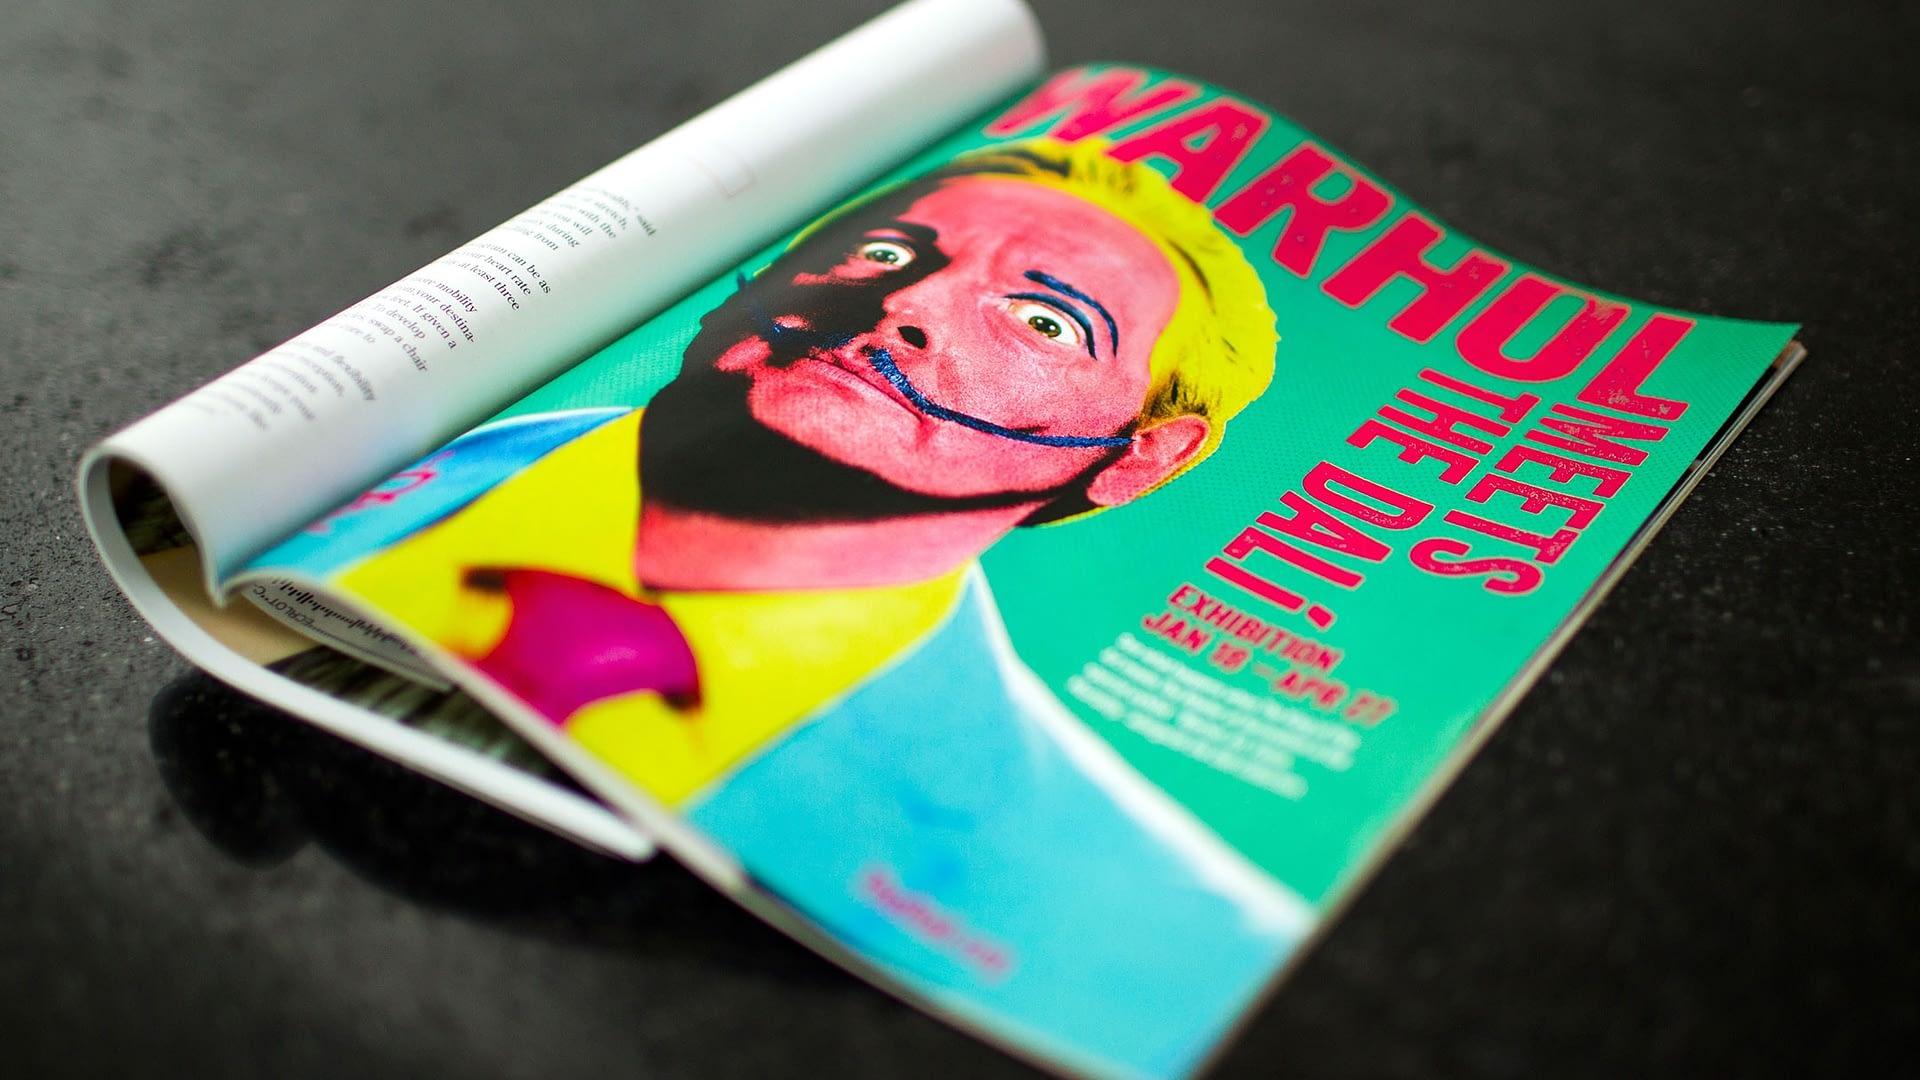 Dali ad in print magazing